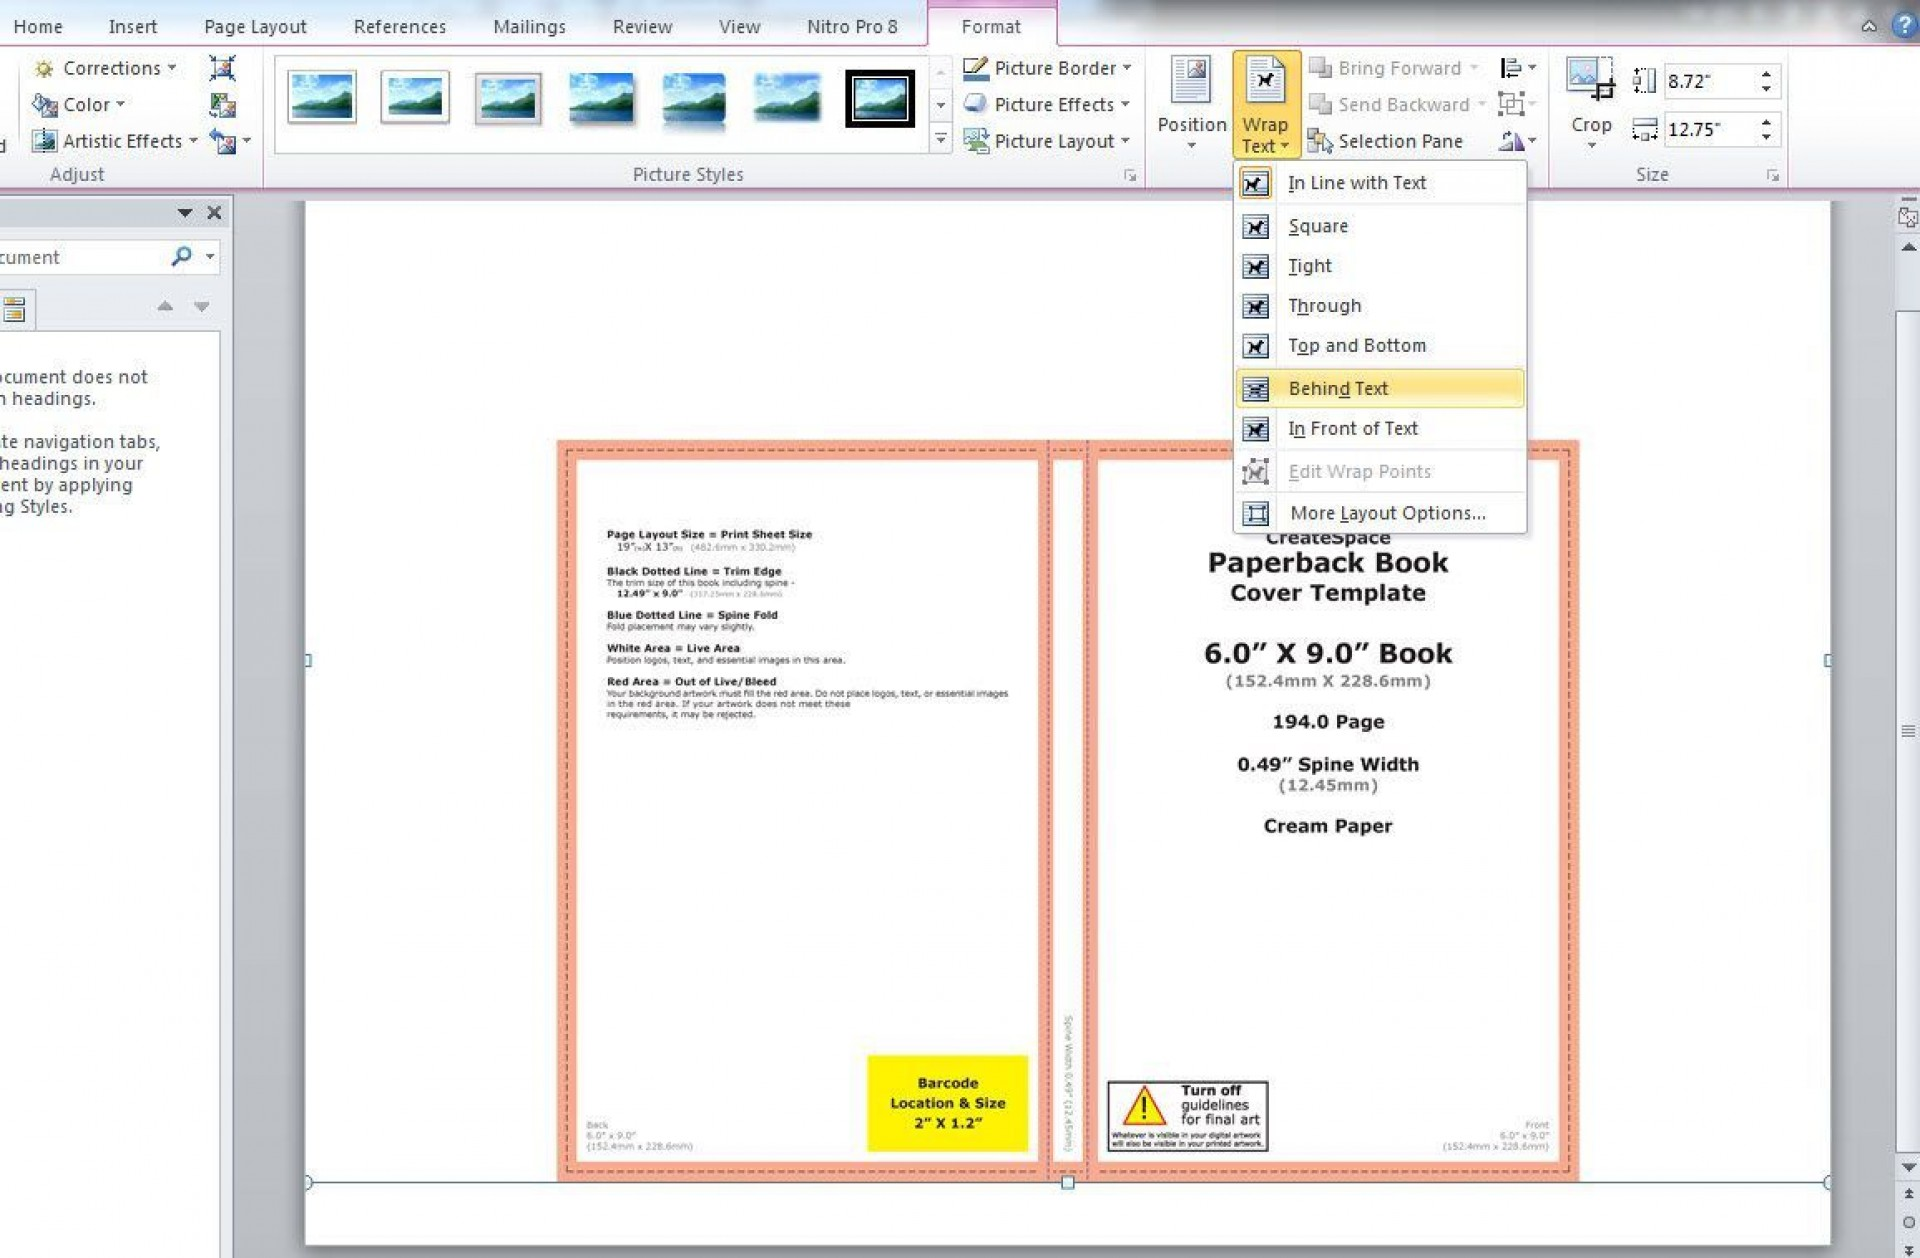 002 Breathtaking Book Template Microsoft Word Idea  Addres Free Outline Comic Script1920